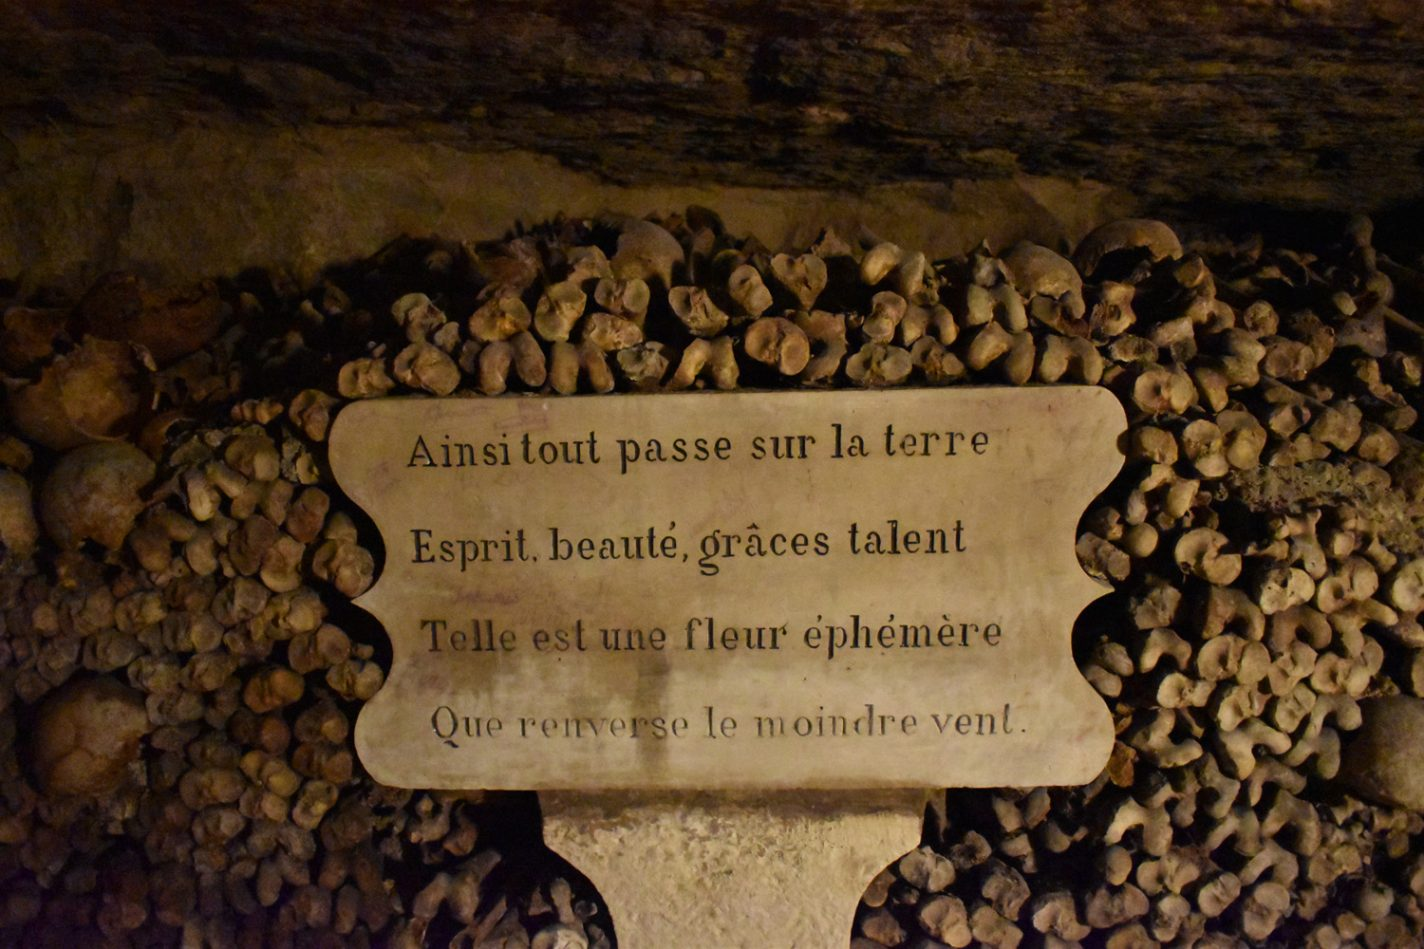 Quotes in les Catacombes - Parijs na de lockdown